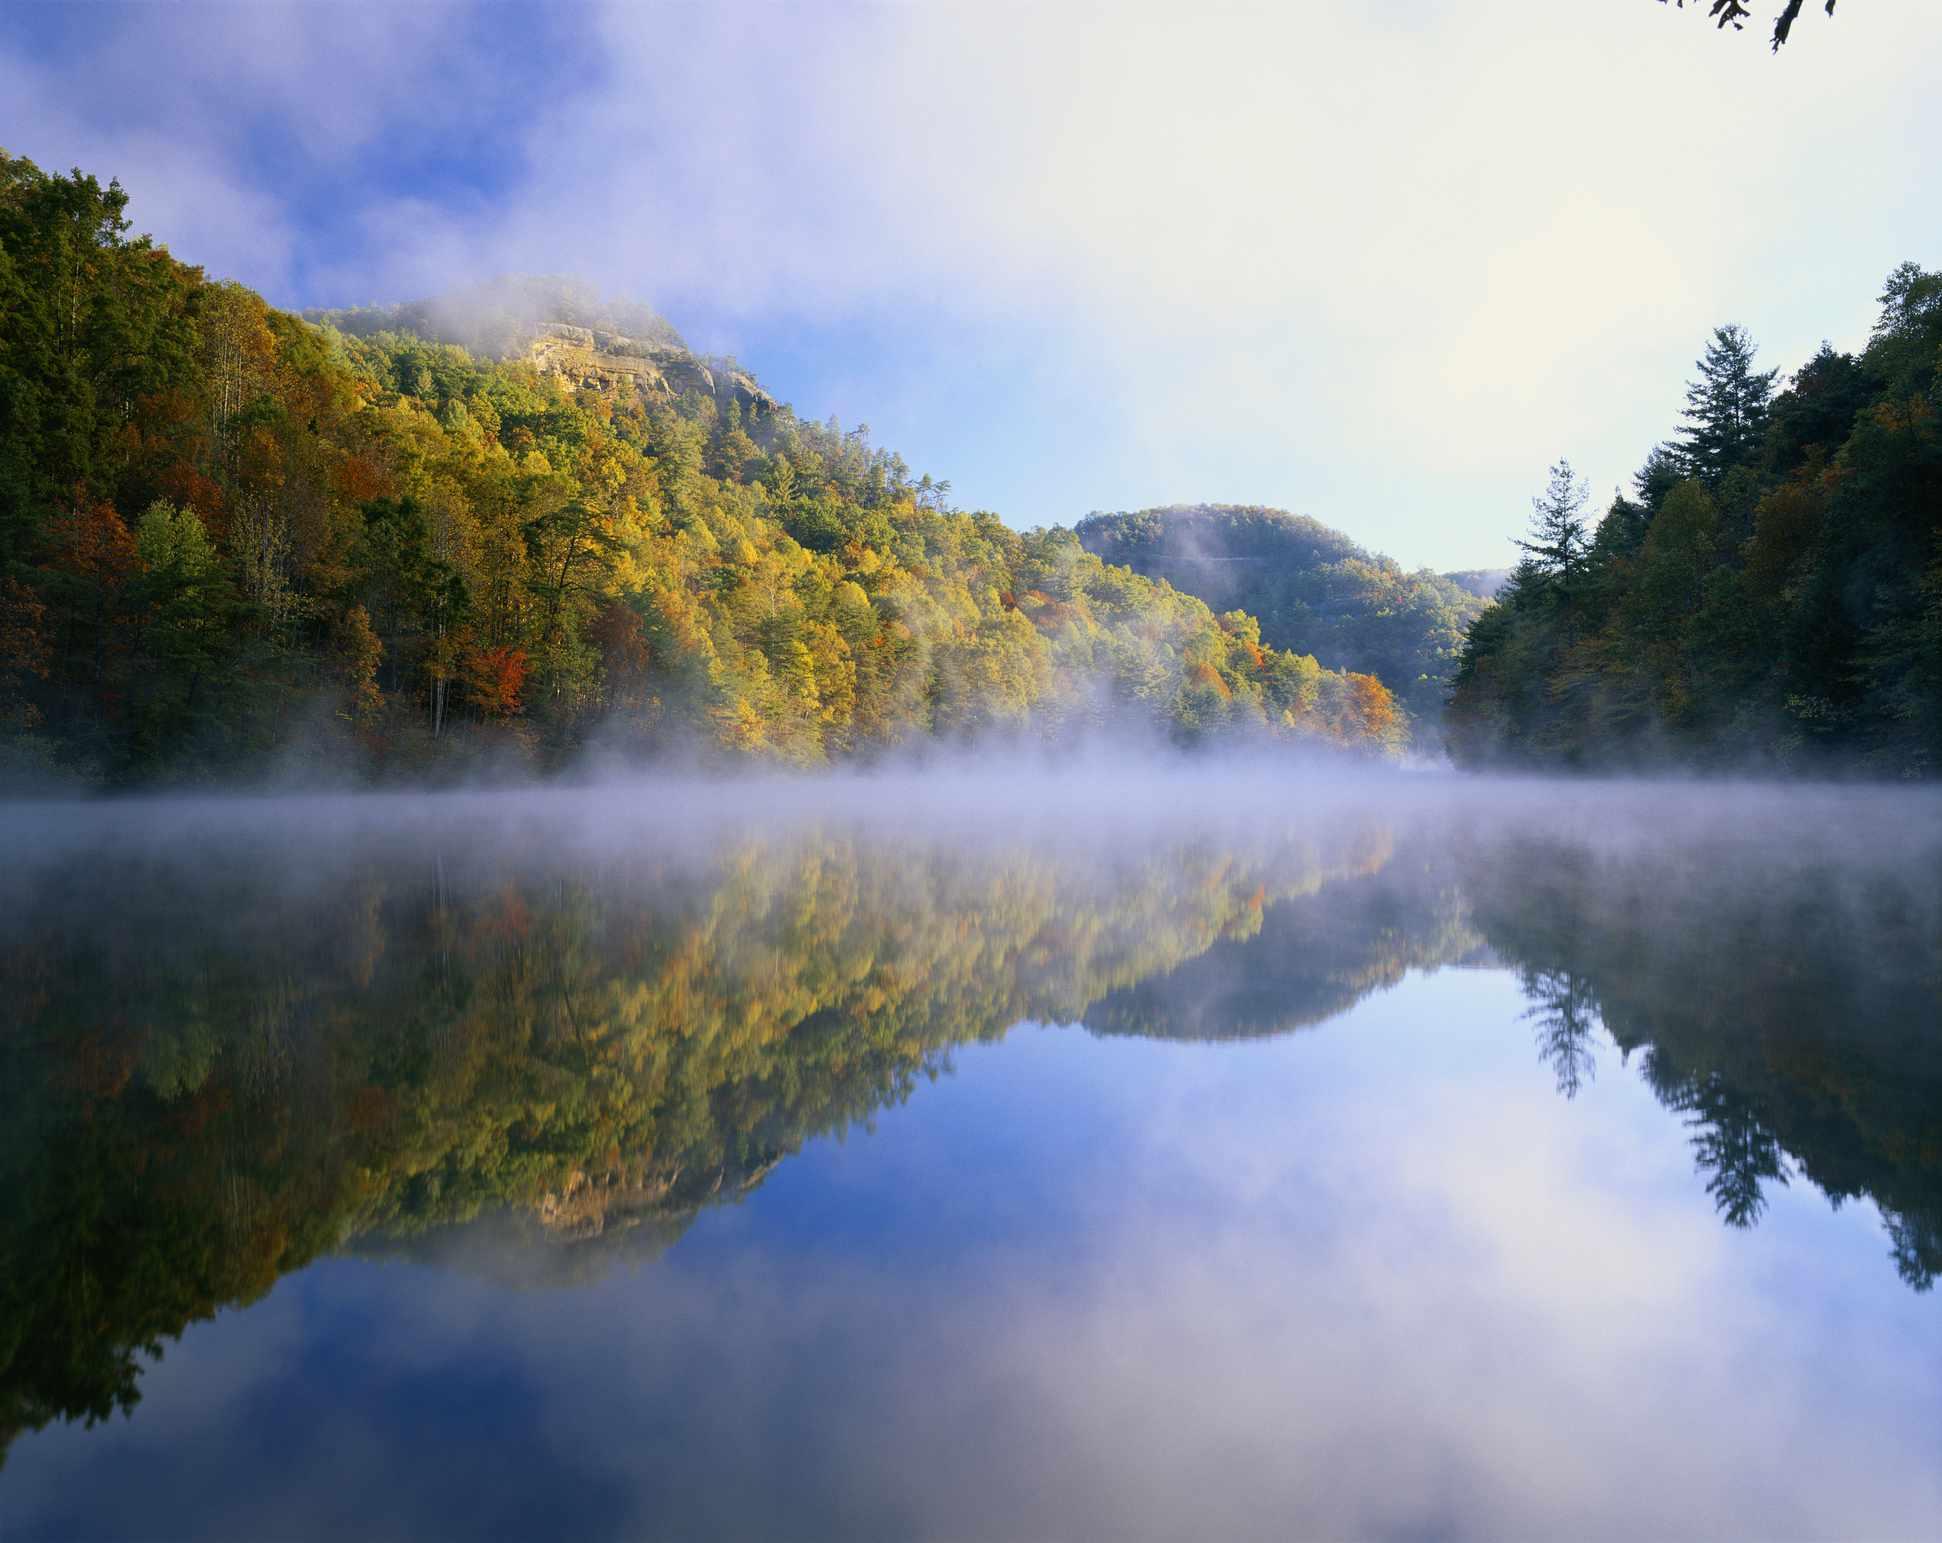 Daniel Boone National Forest in Kentucky